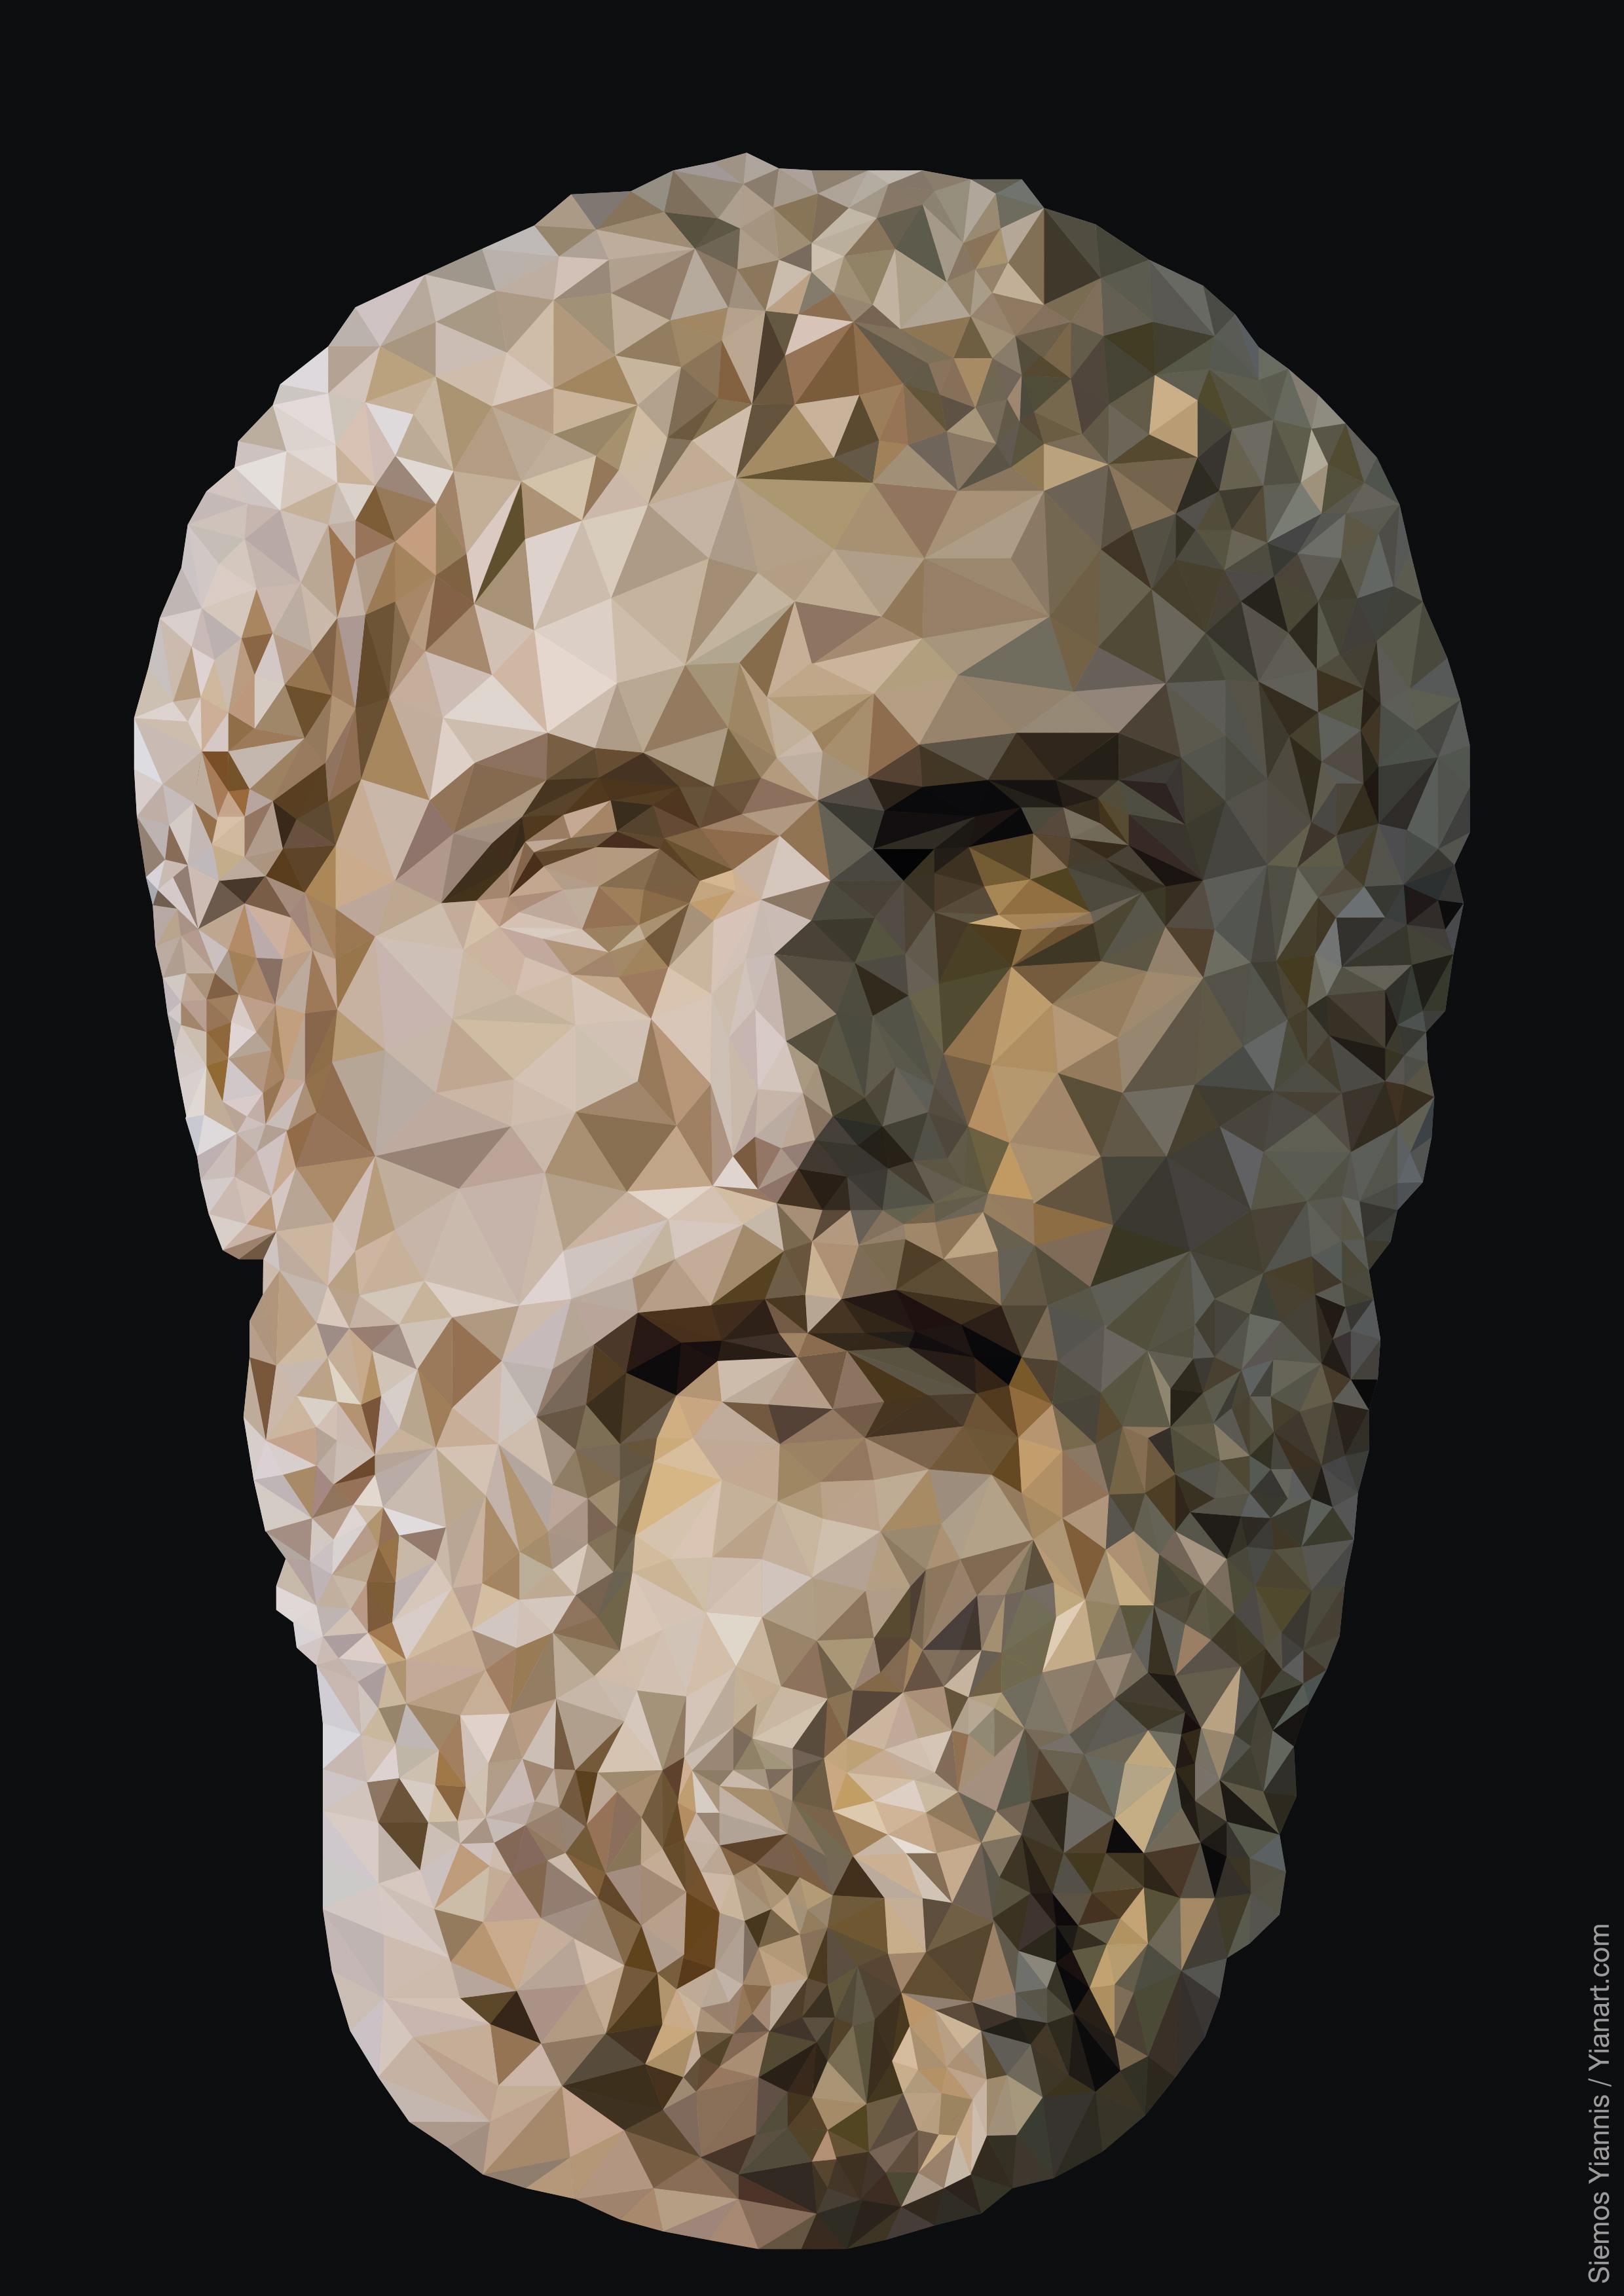 Plato_Yianart.com